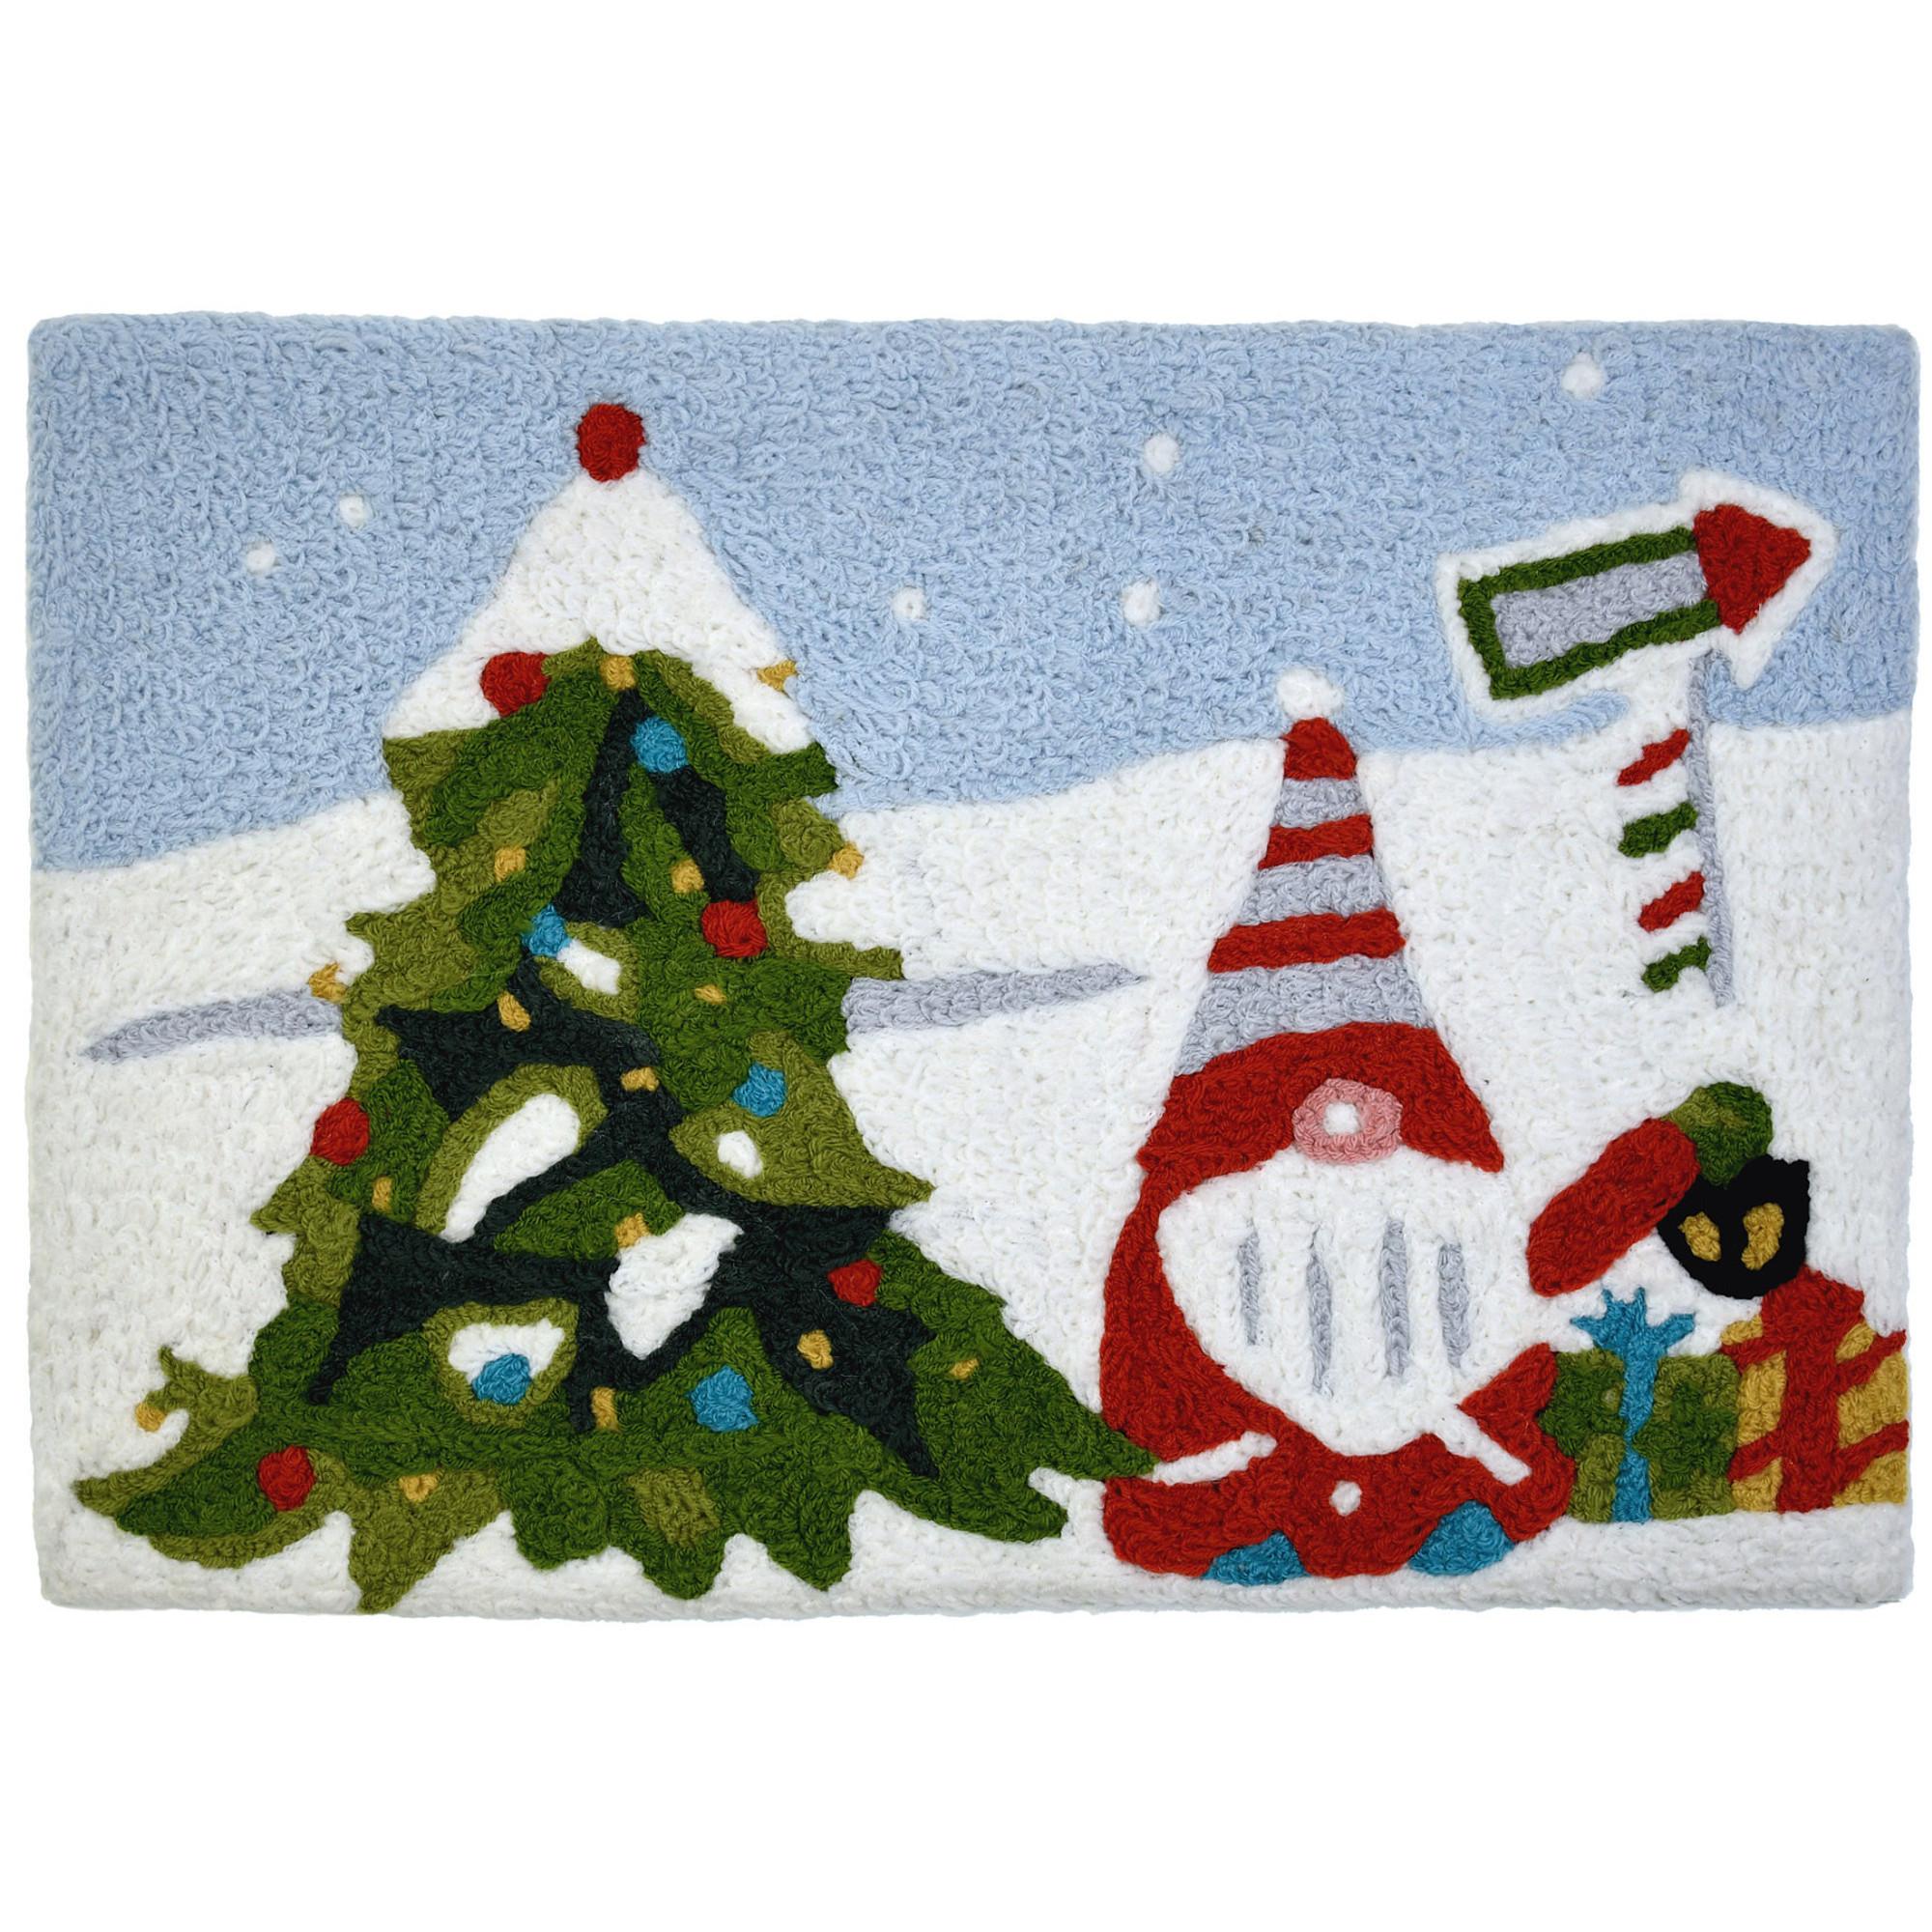 Christmas Gnome w/ Christmas Tree Rug 20 x 30 Jellybean Accent Rug